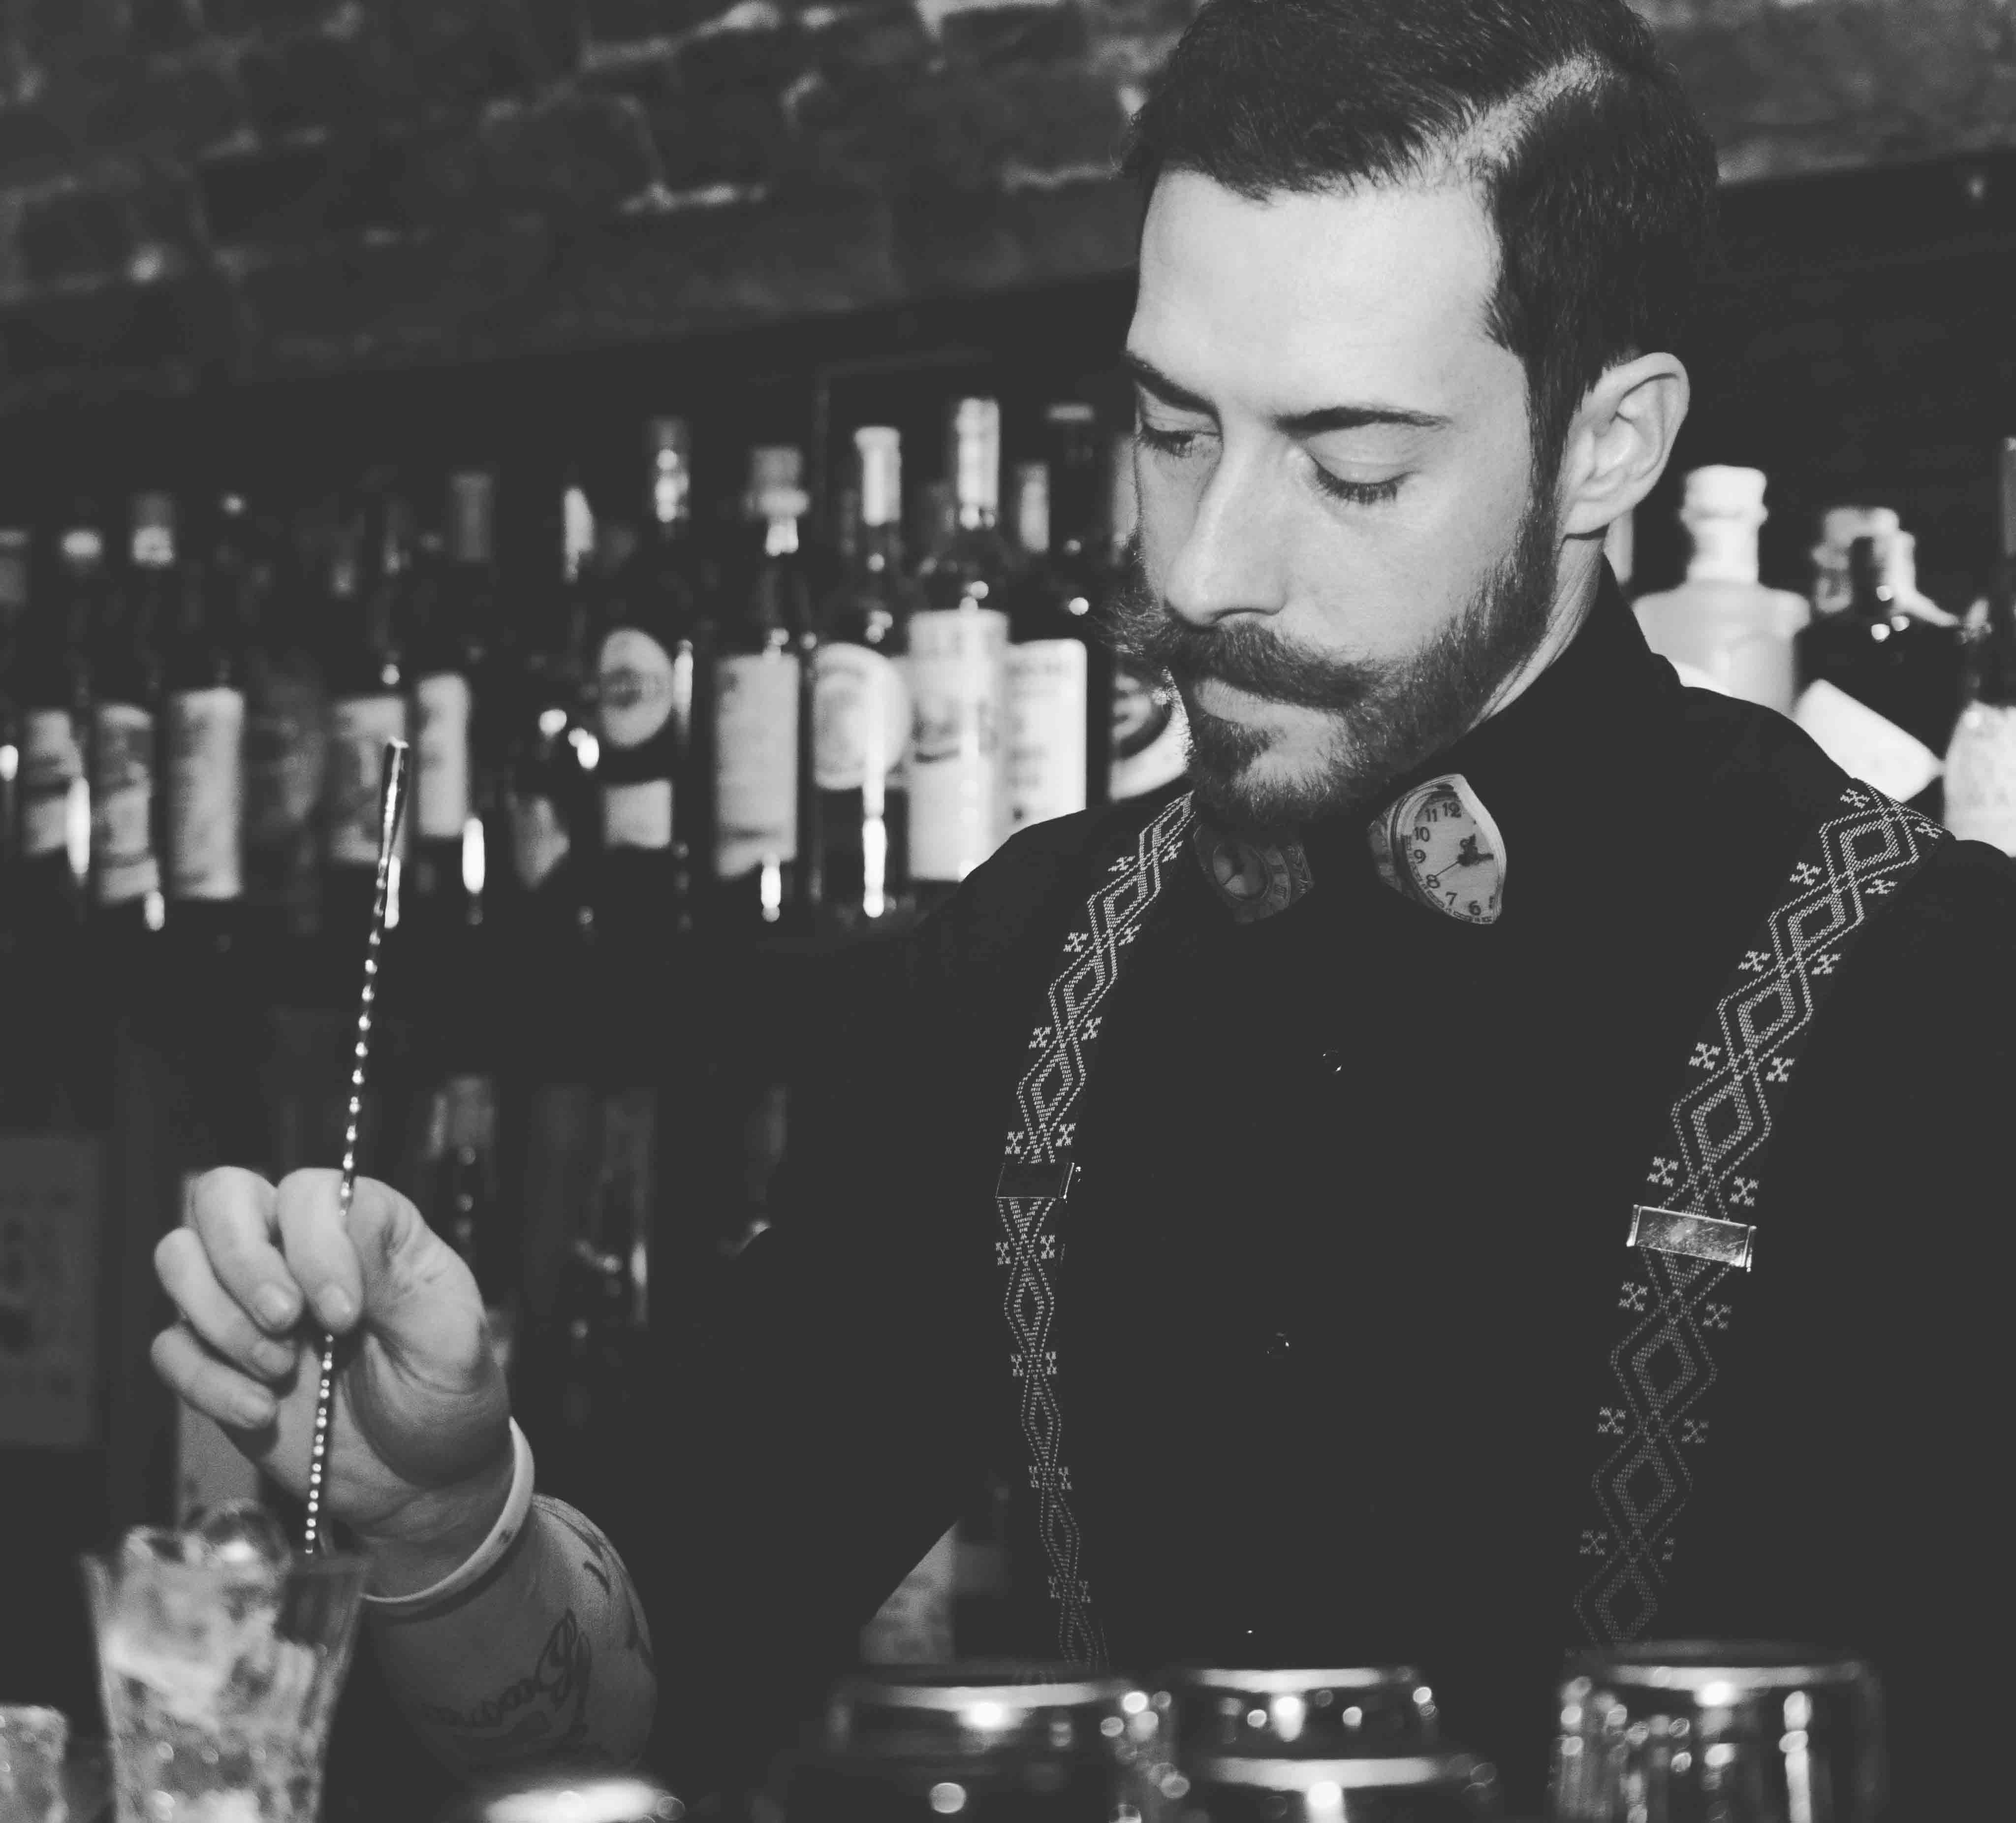 Bartender Daniele Zito